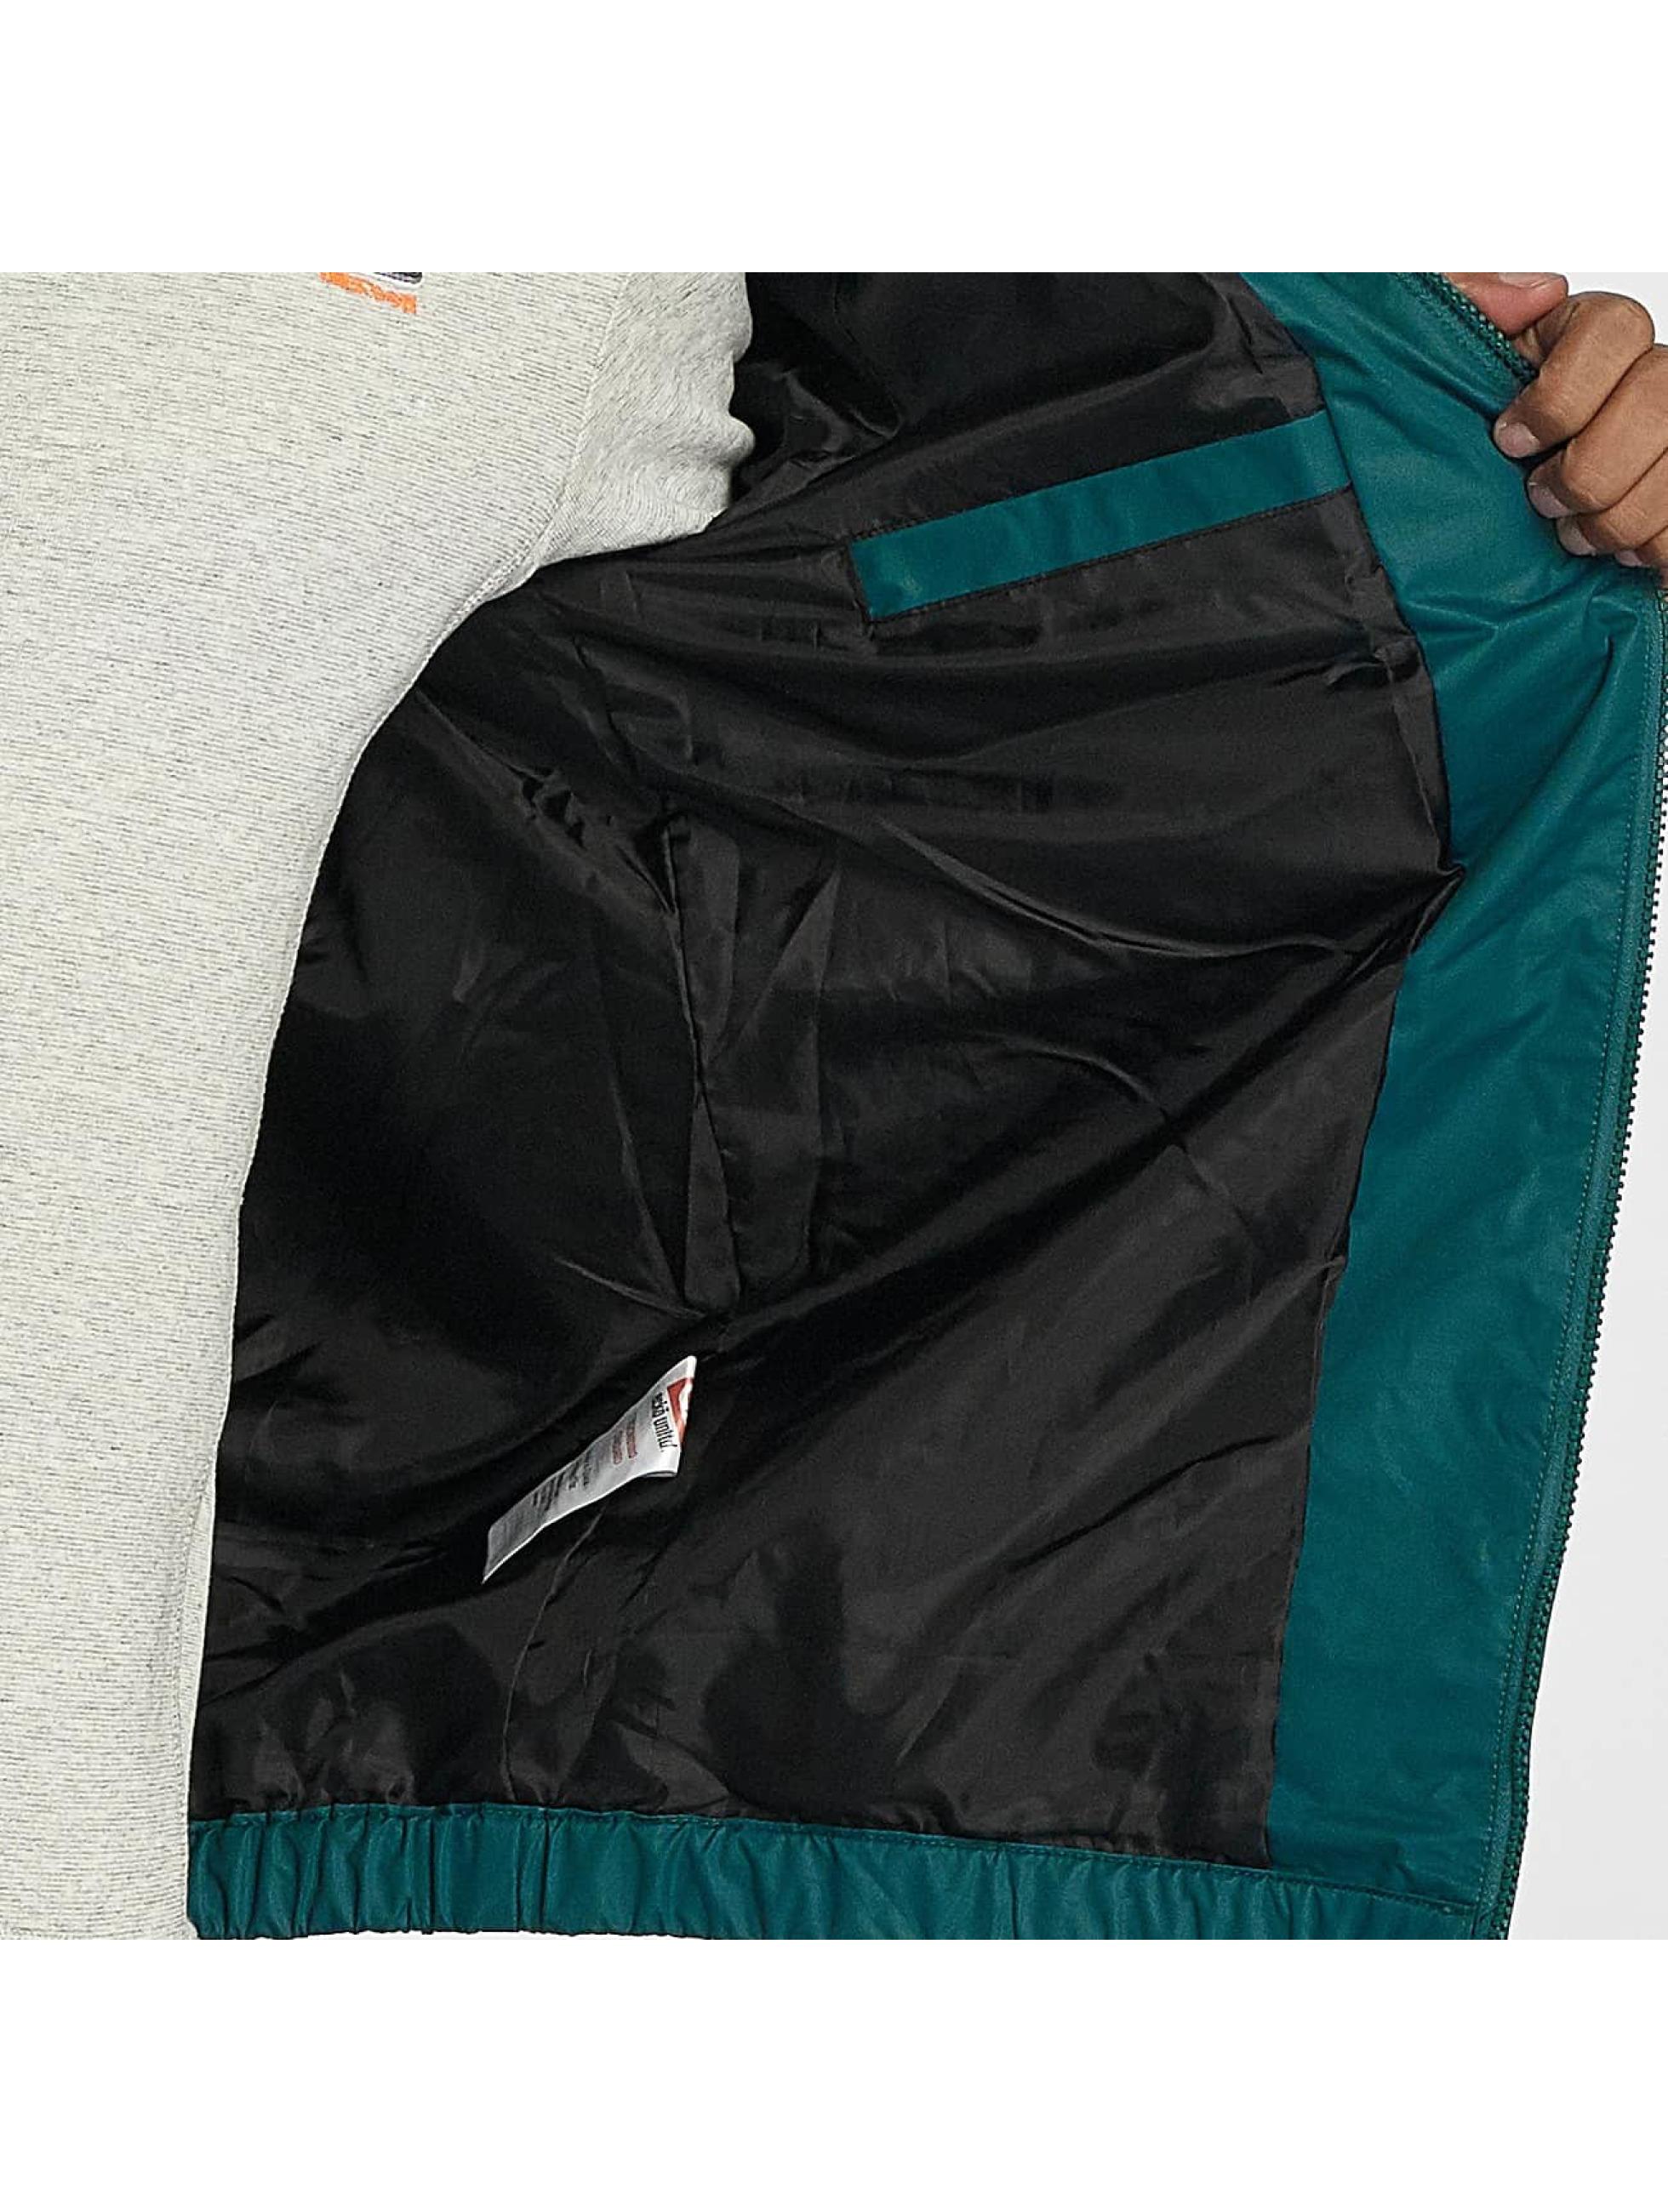 Ecko Unltd. Lightweight Jacket Tony Tornado turquoise